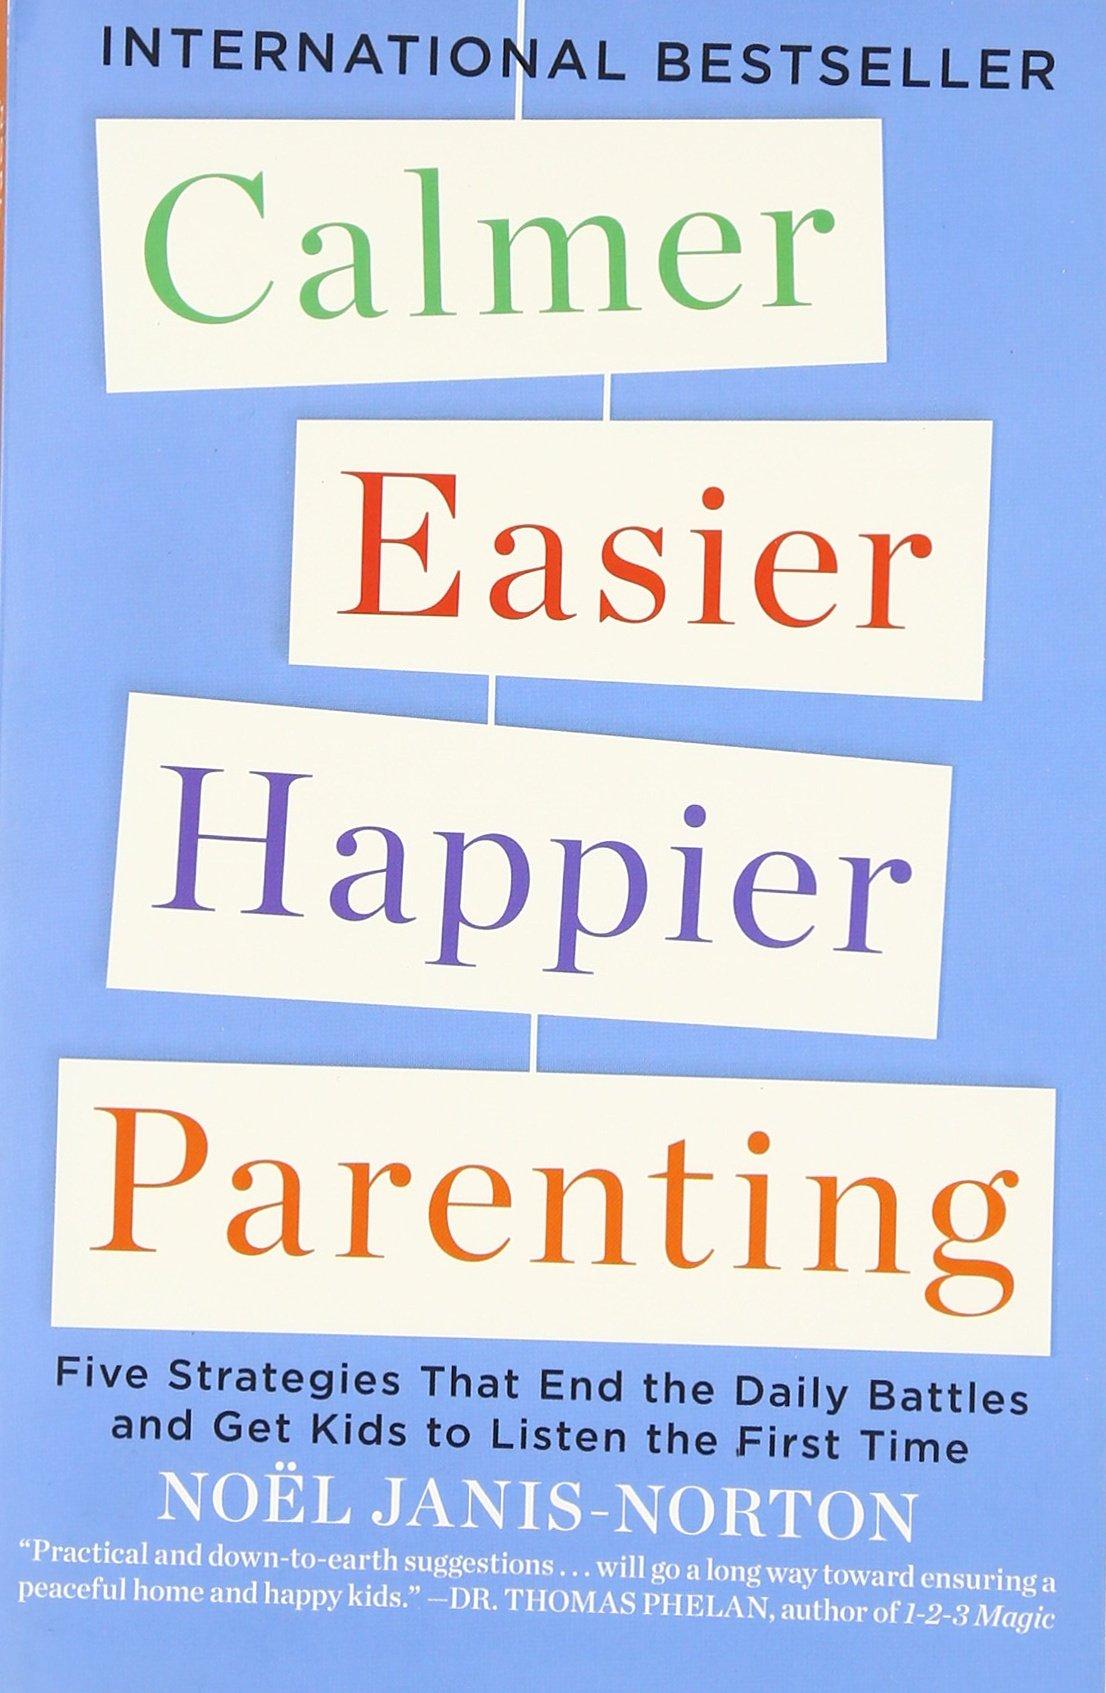 Calmer Easier Happier Parenting Strategies product image